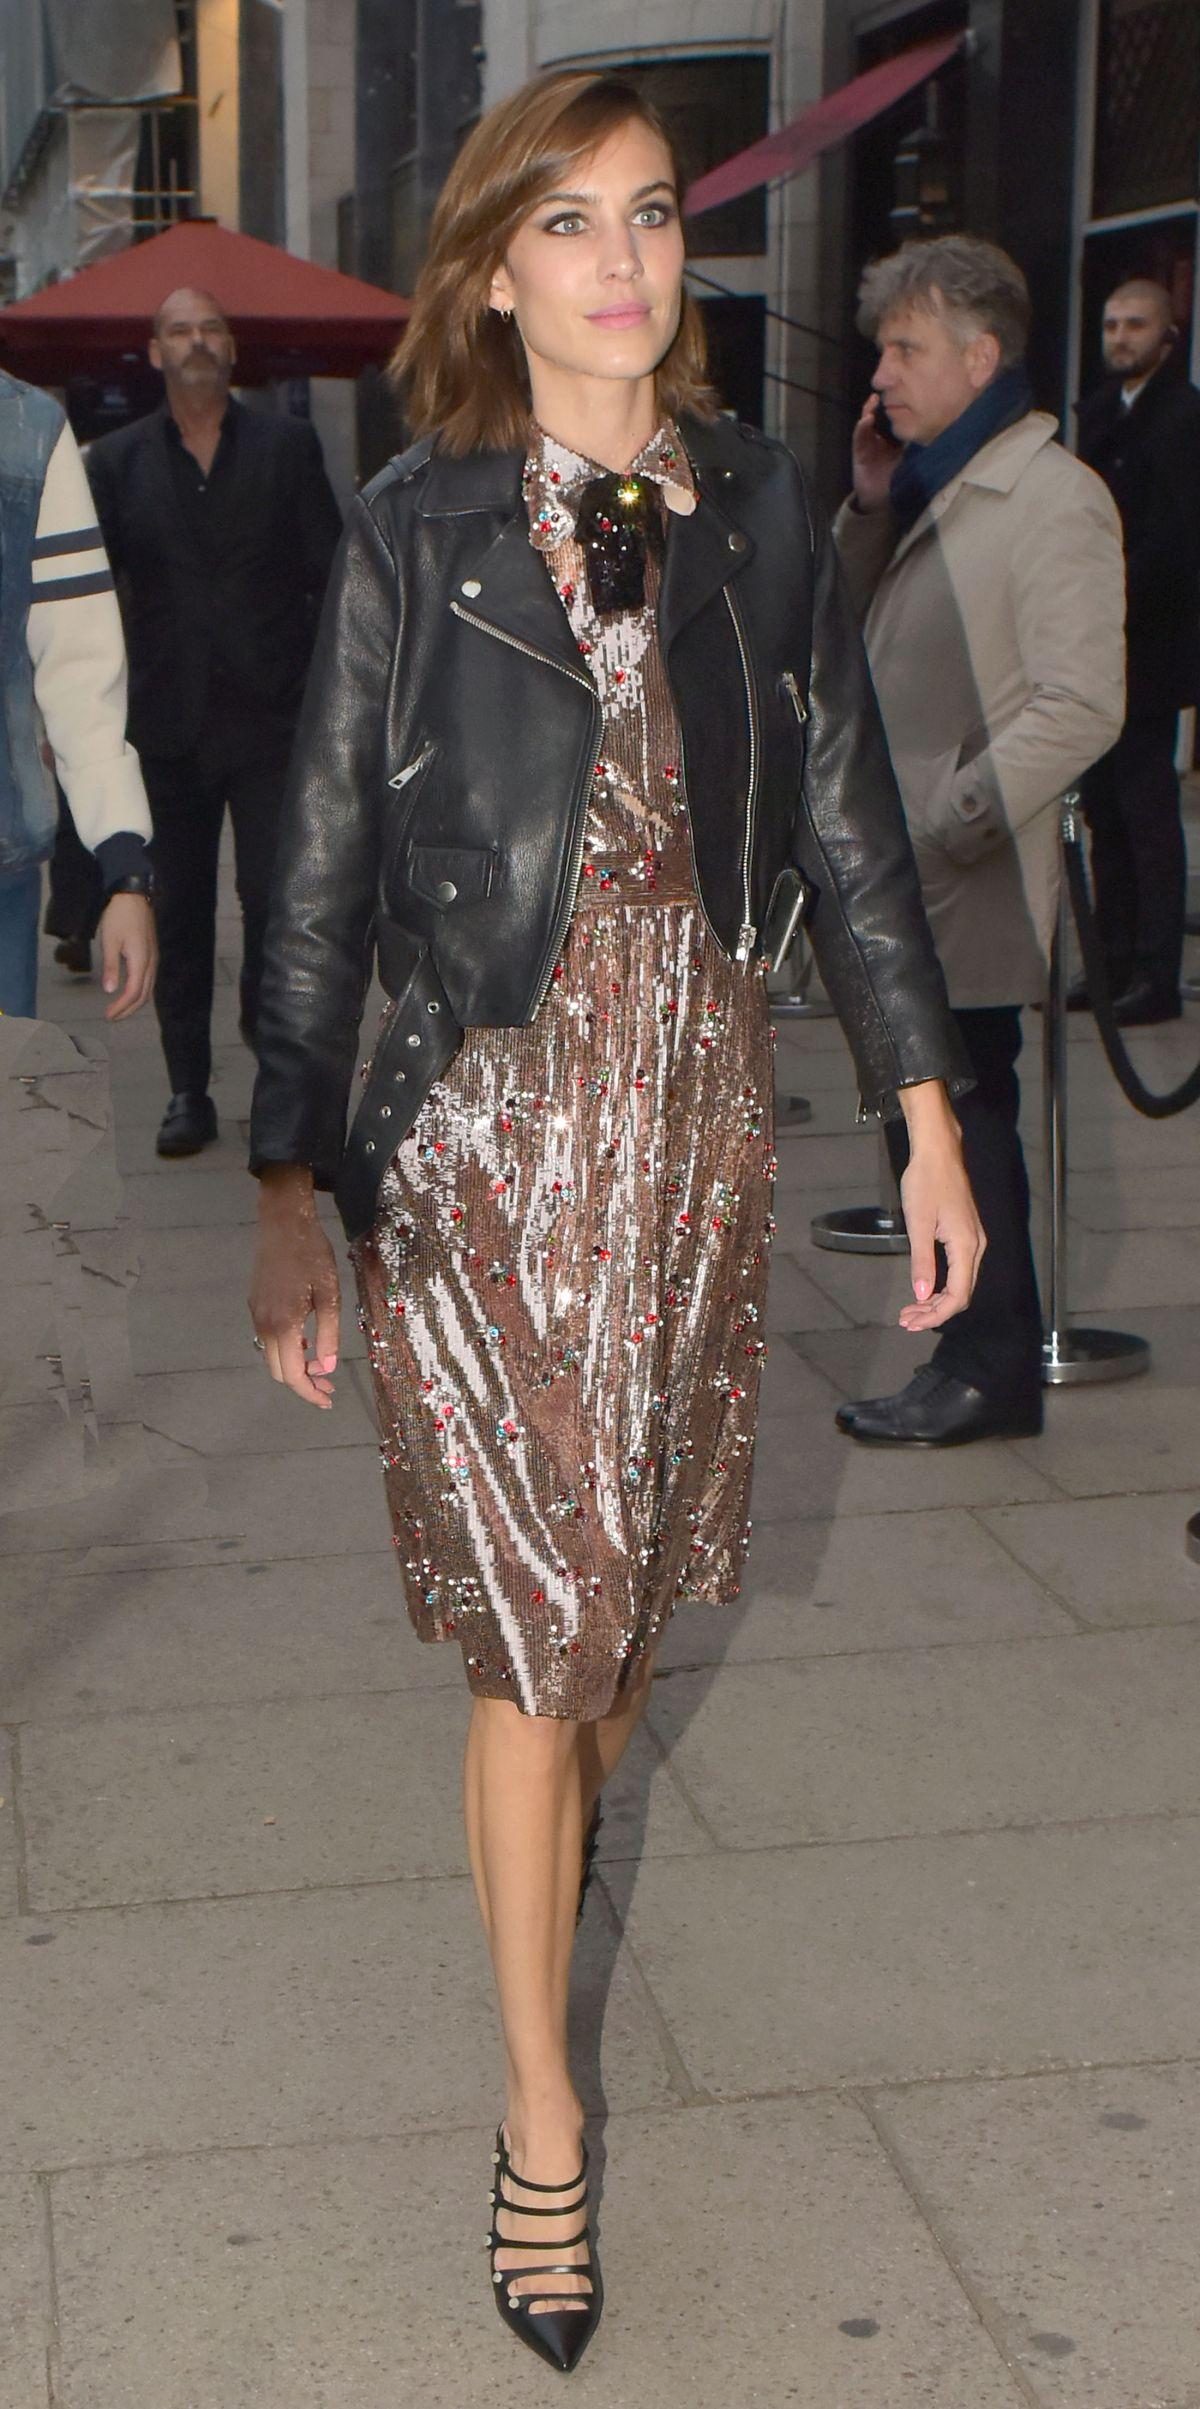 ALEXA CHUNG at Gucci Party in London 06/02/2016